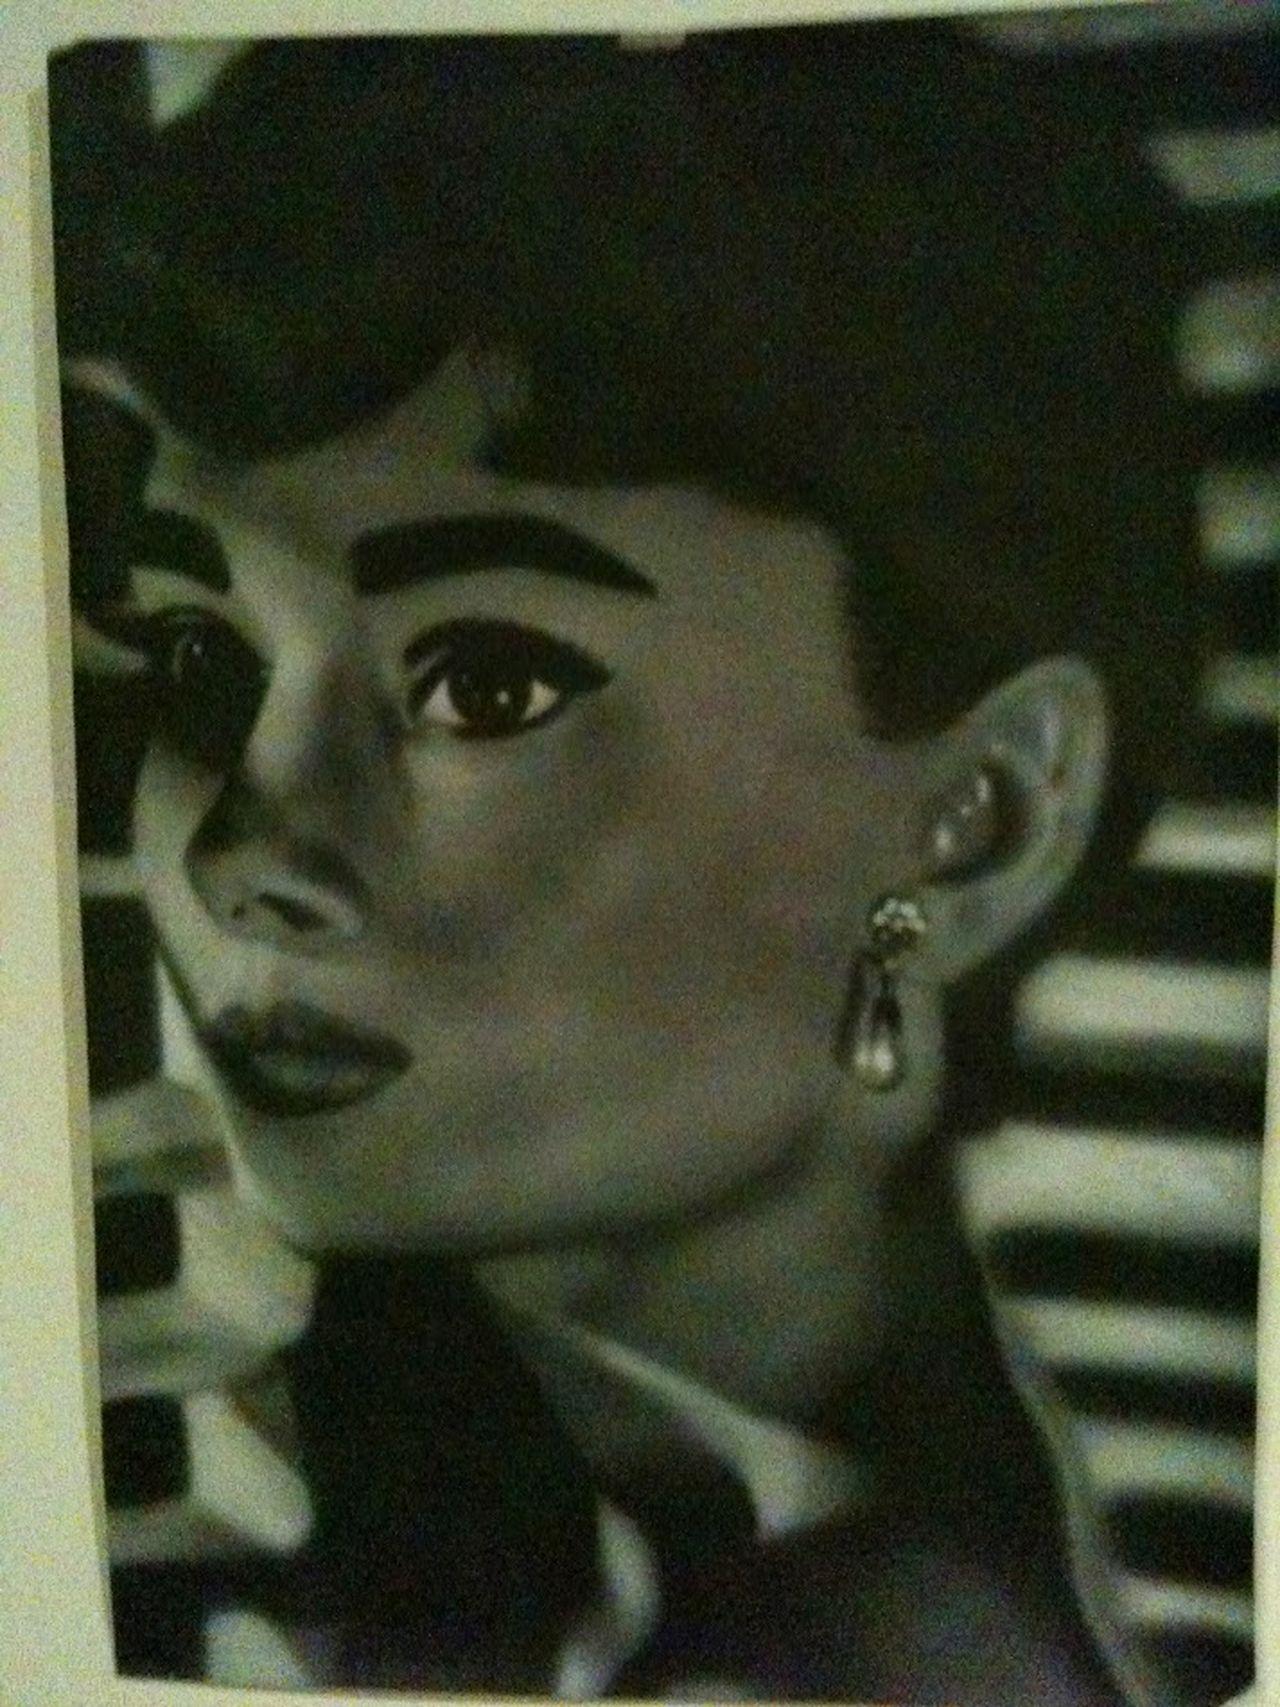 Airbrush ArtWork Audrey Hepburn Blackandgrey Blackandwhite Contemplation Headshot Human Face Painting Portrait